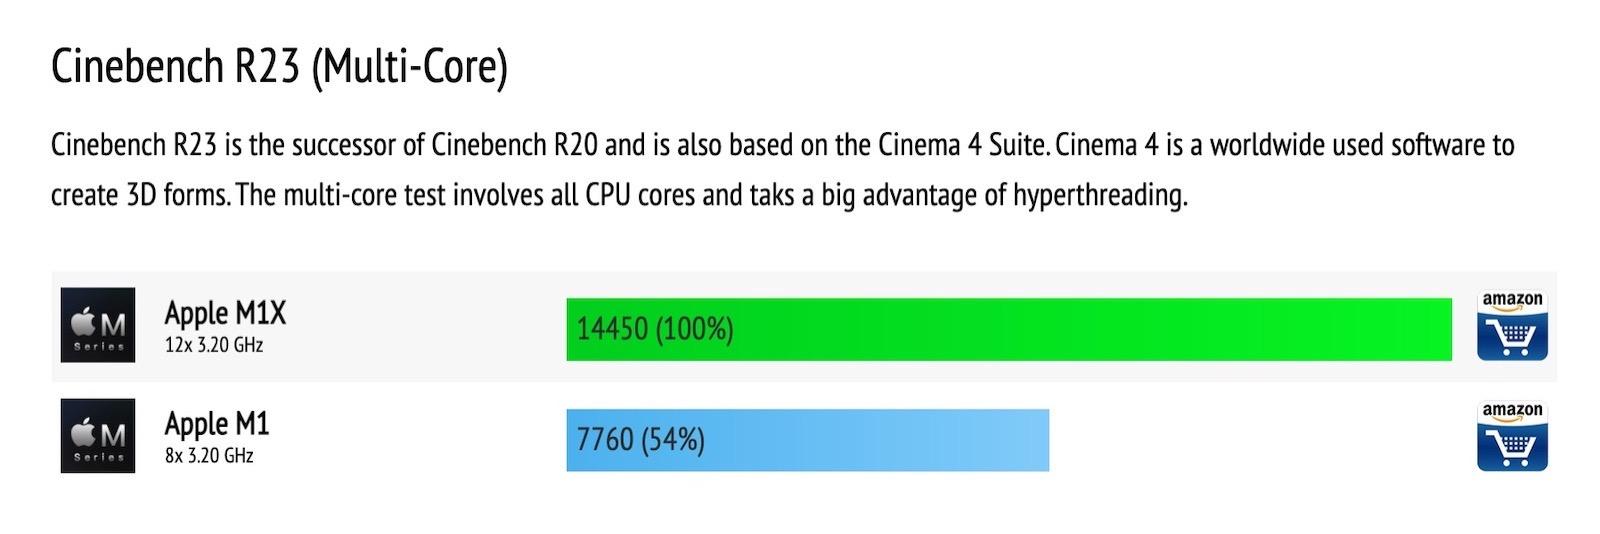 M1x benchmark scores